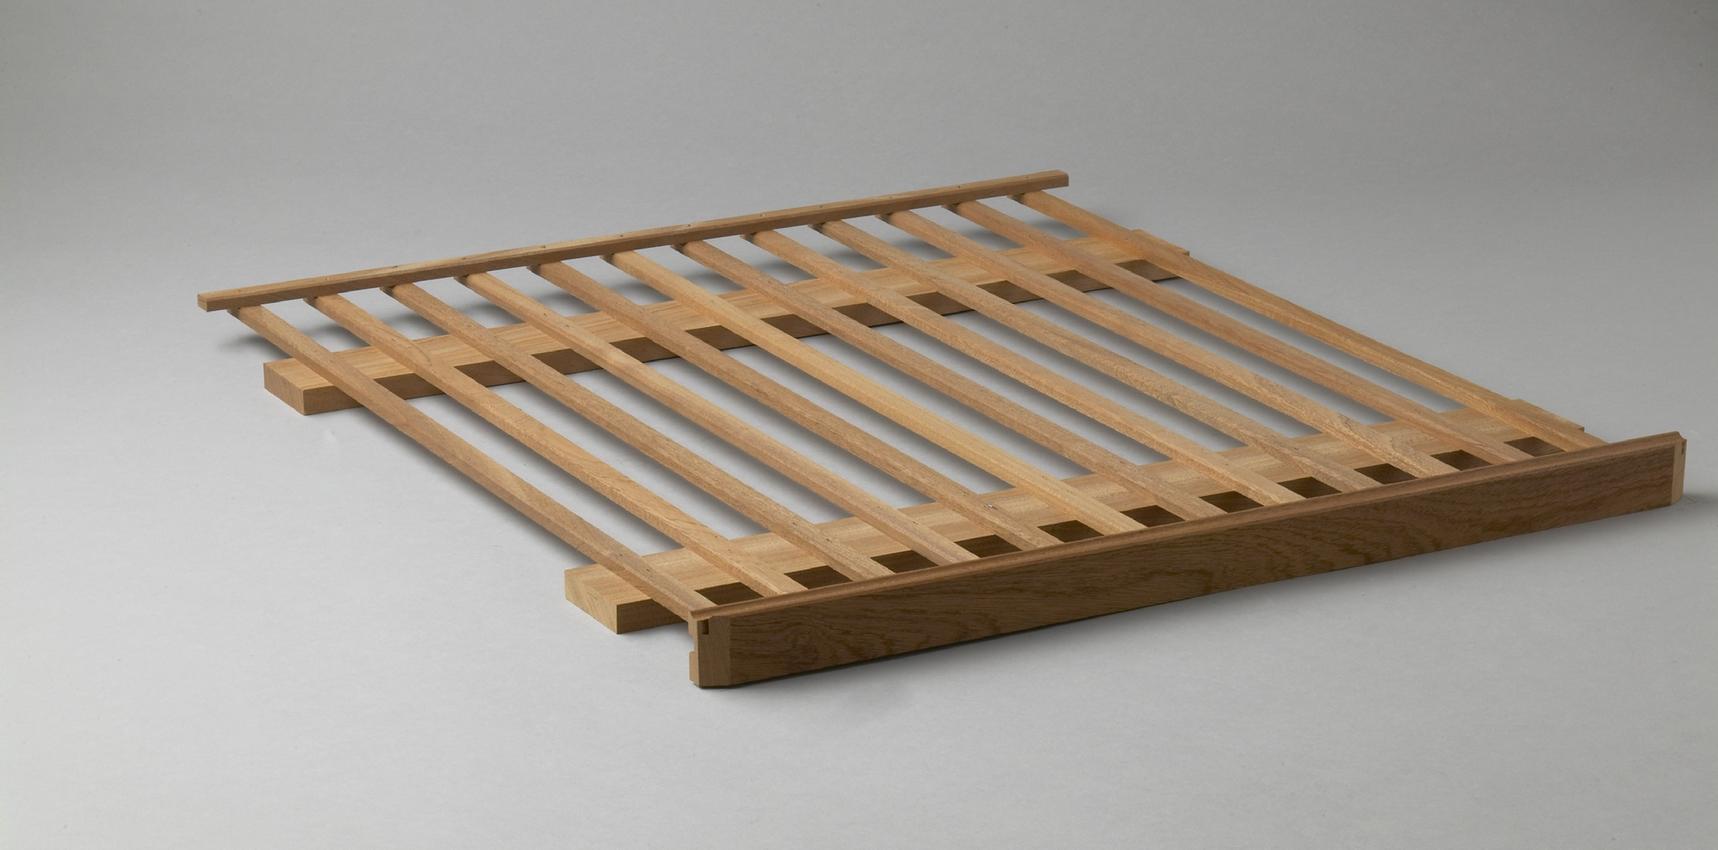 premium-bgn-wooden-shelf-with-2-sliding-rails